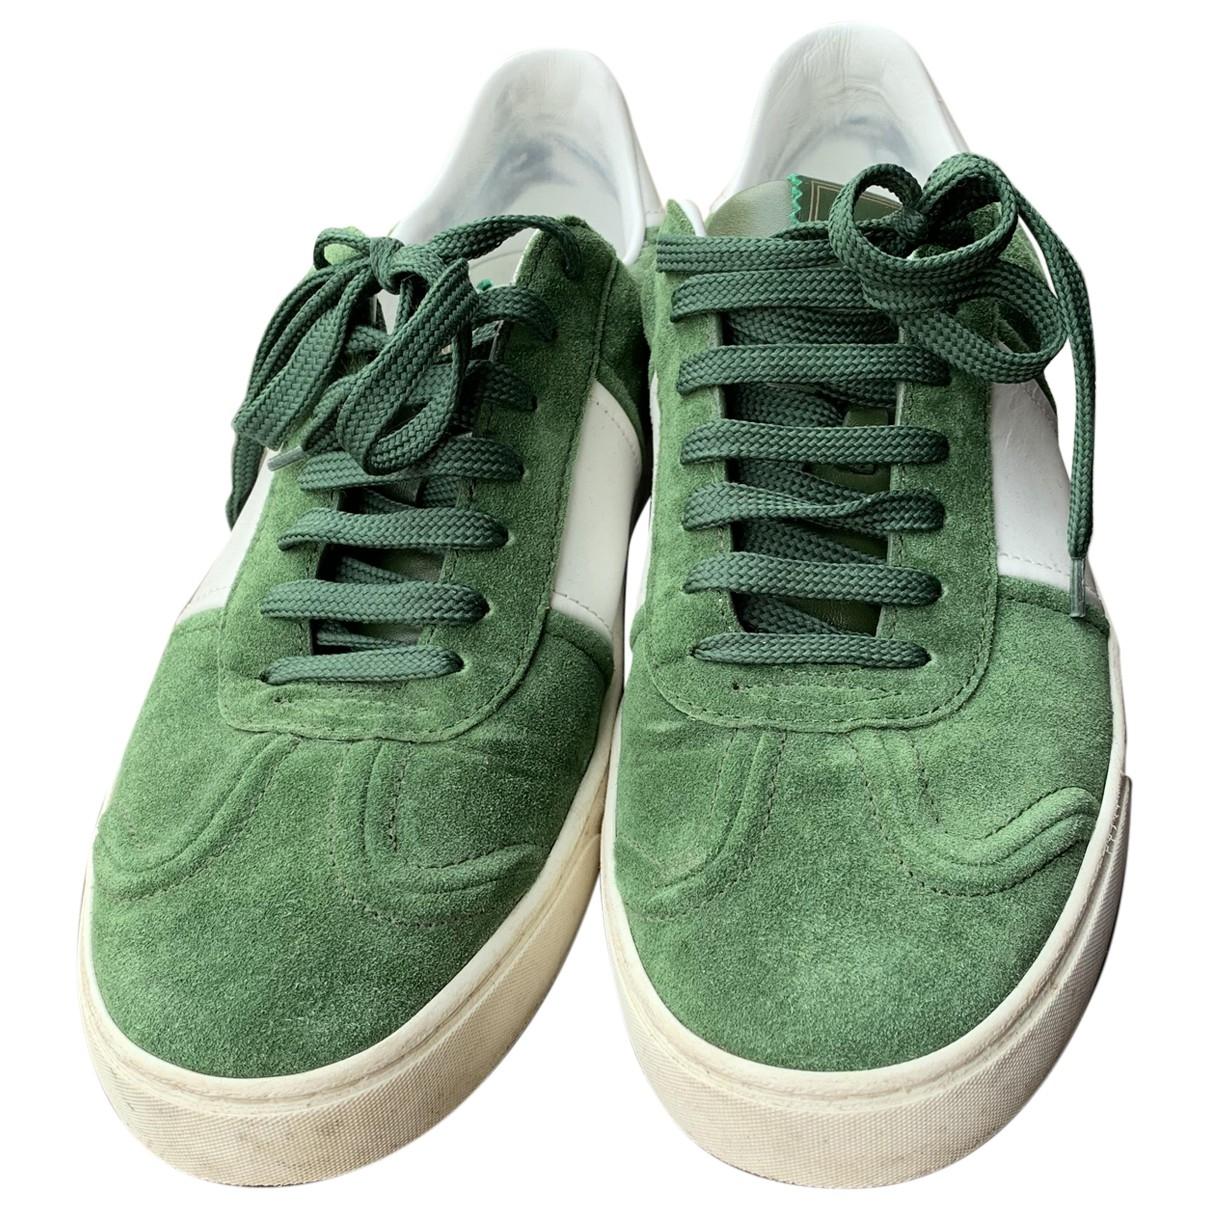 Valentino Garavani Rockstud Sneakers in  Gruen Veloursleder